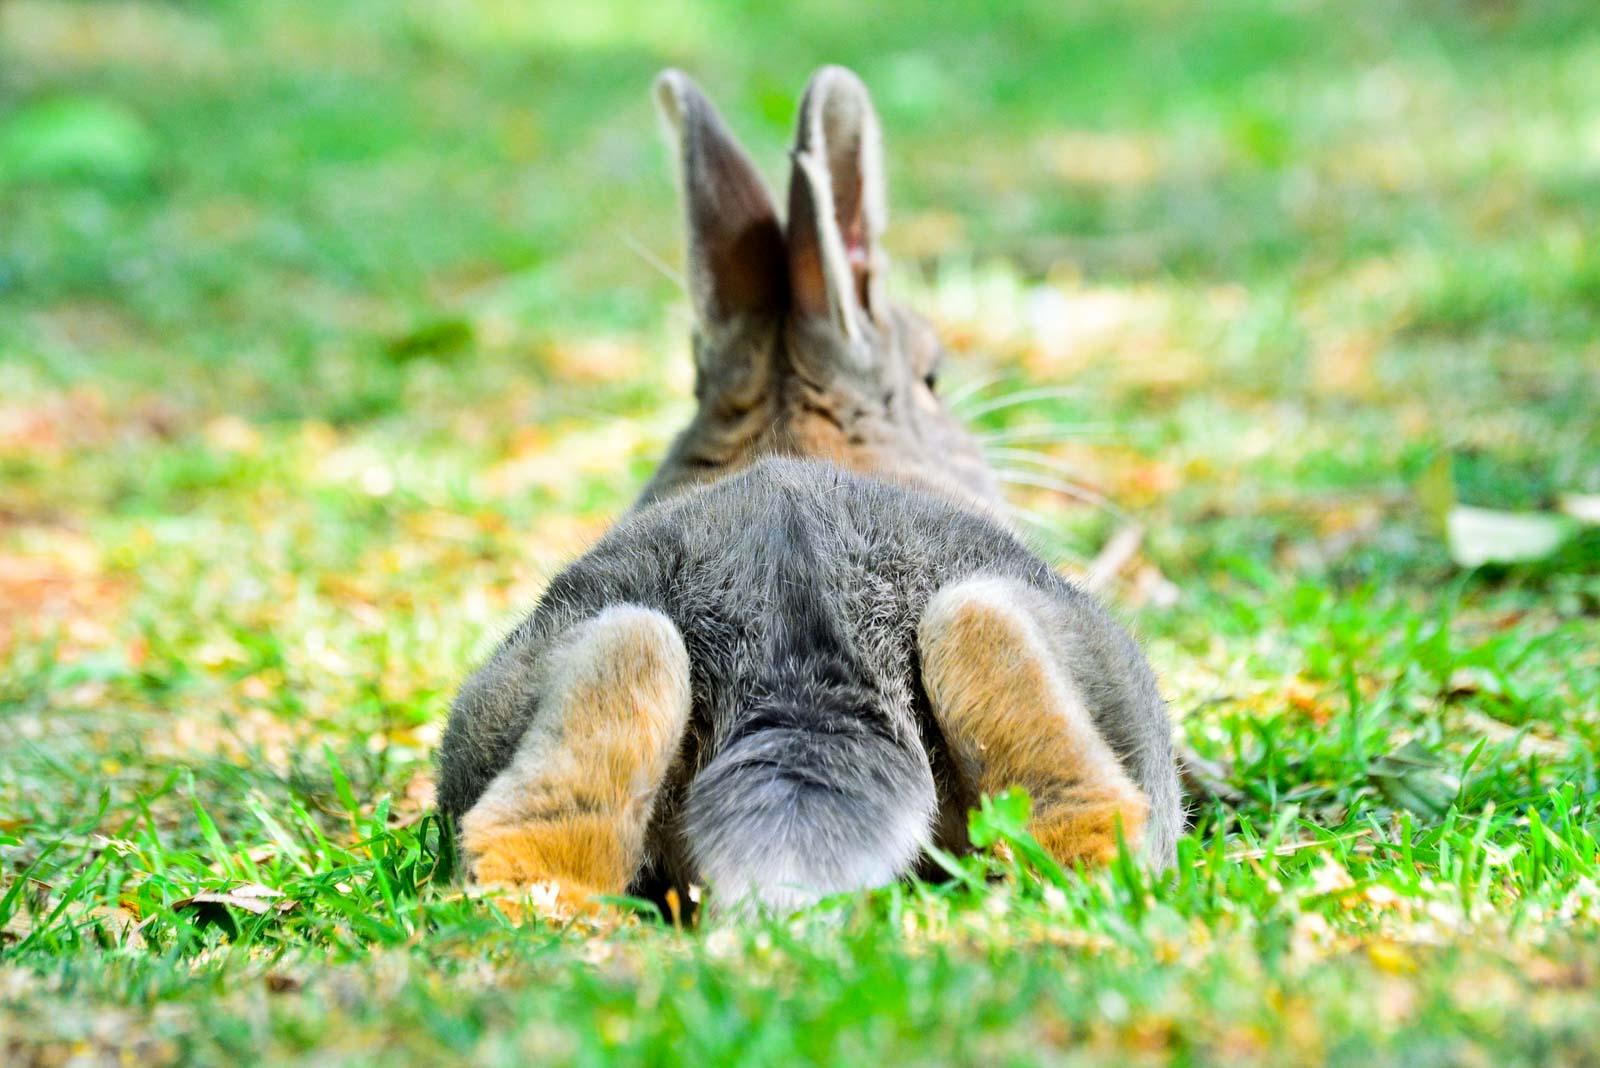 Lapin allongé dehors dans l'herbe